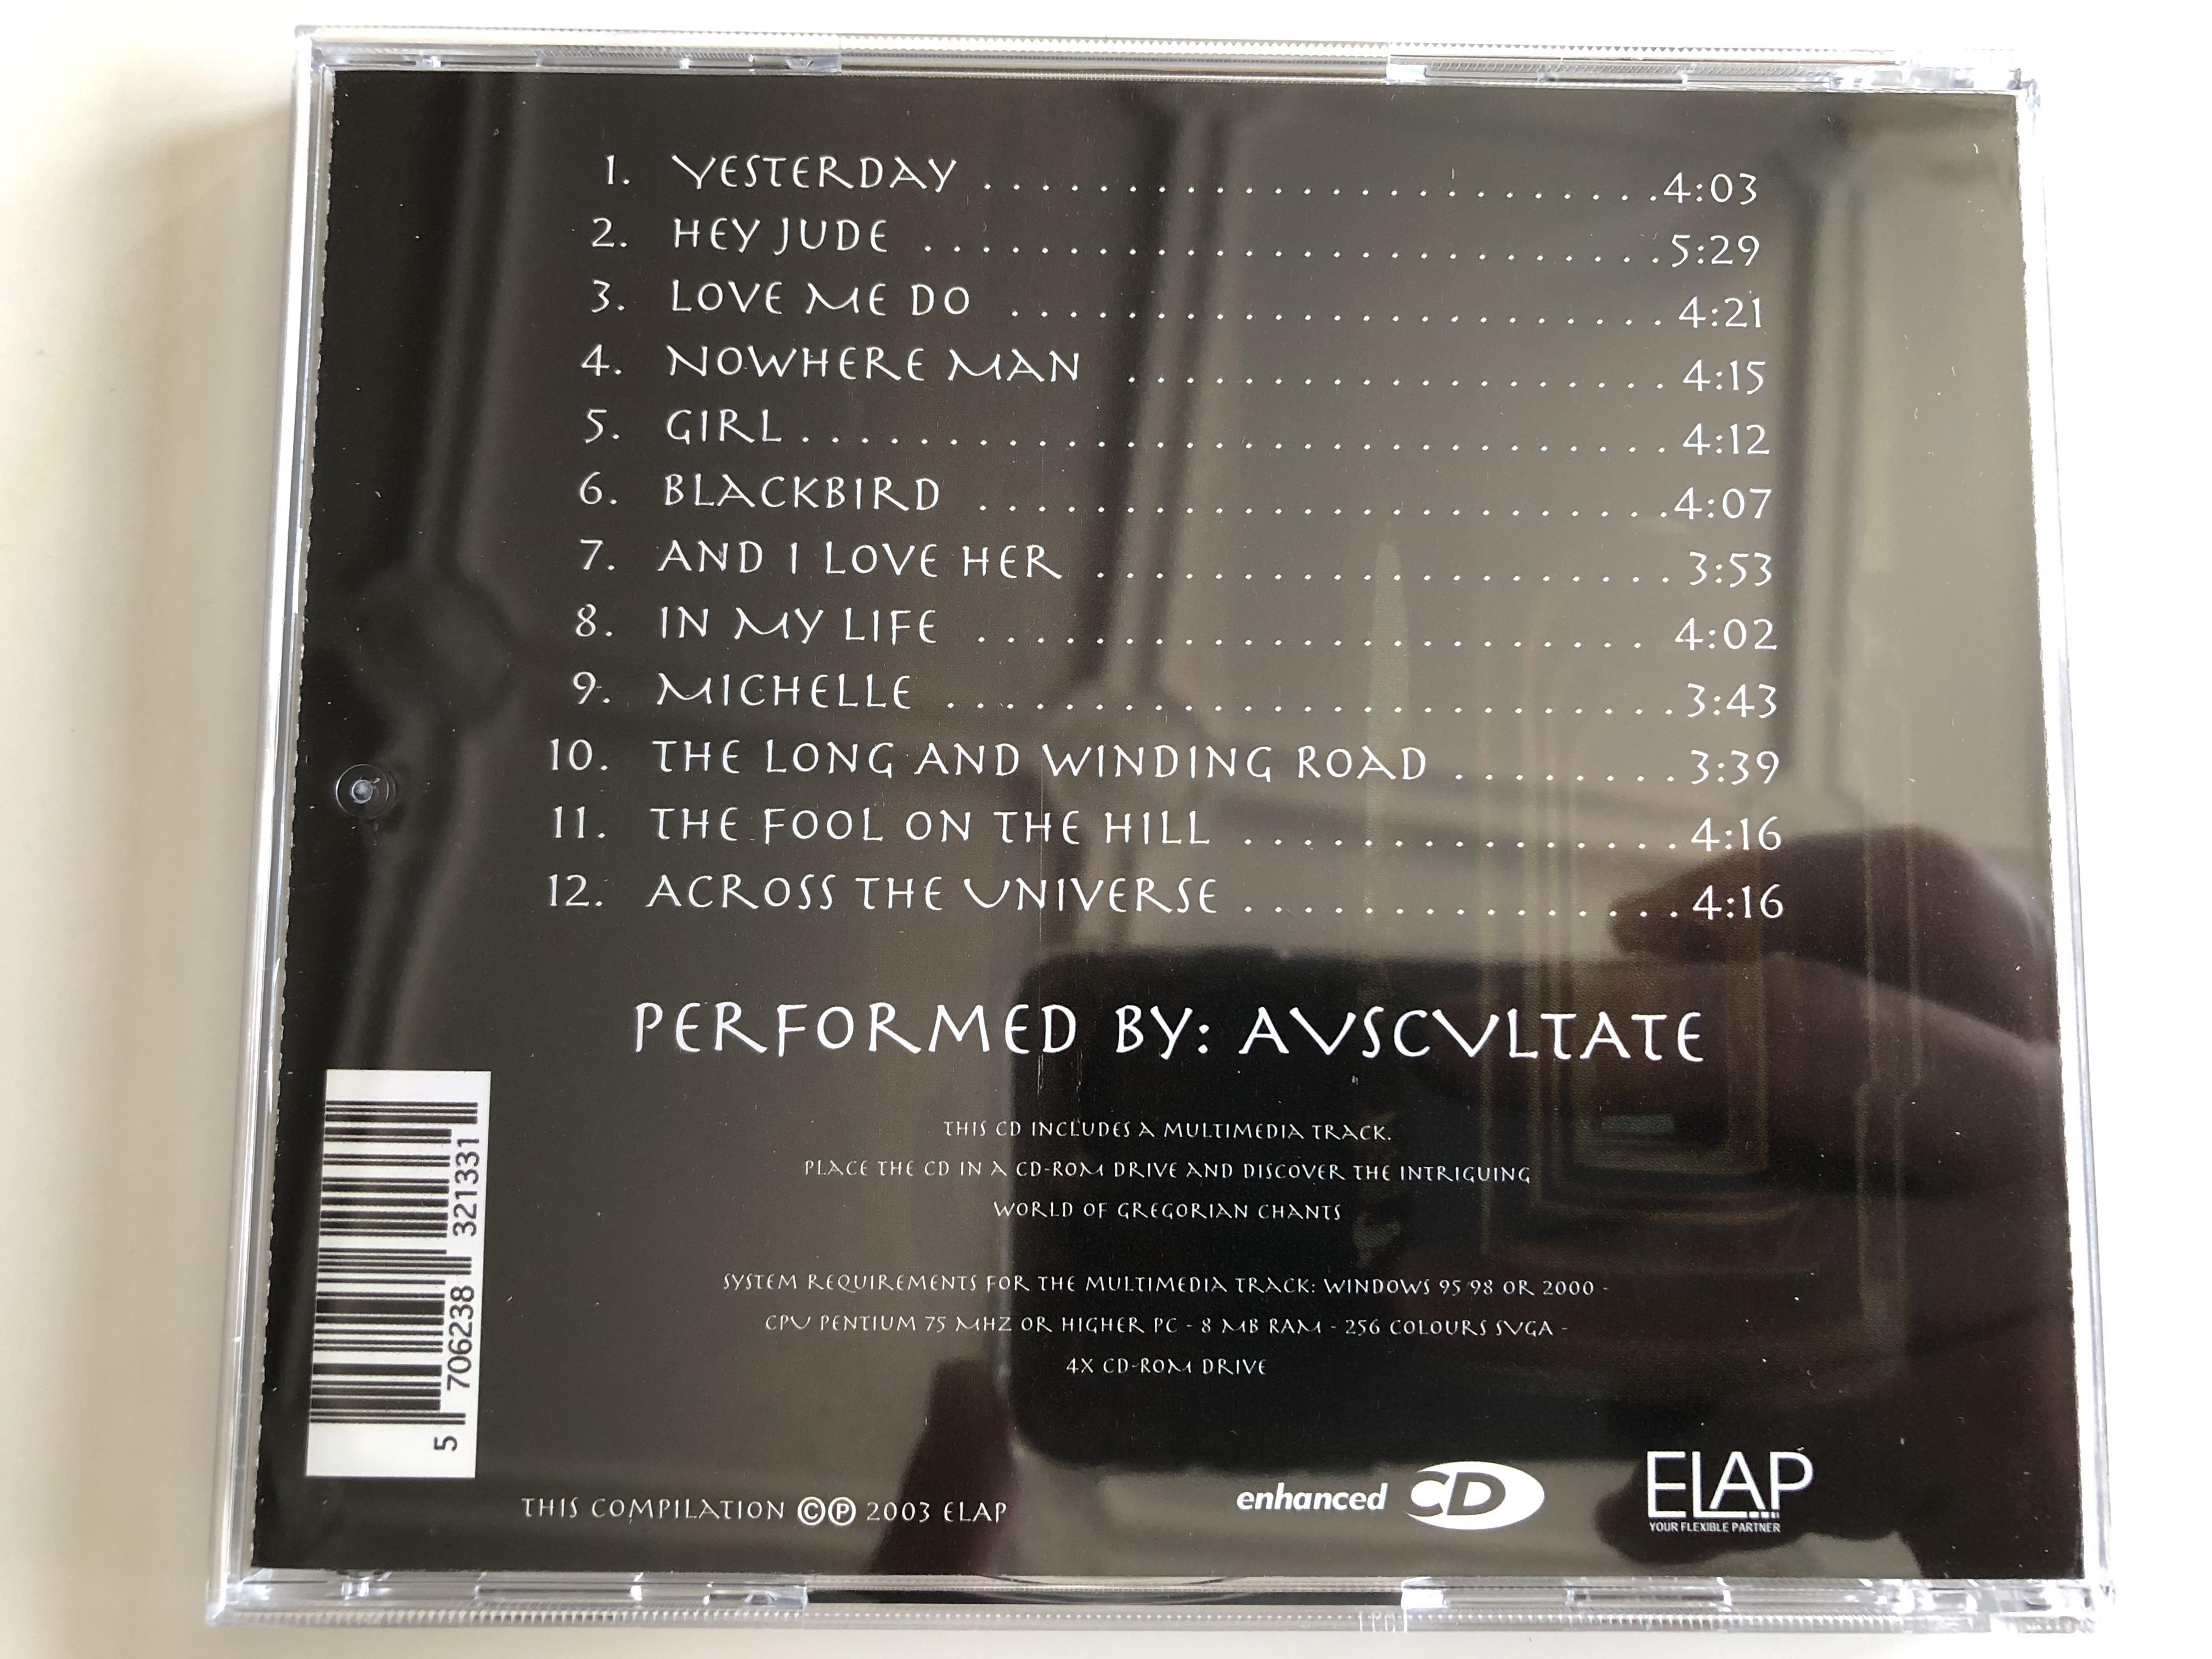 gregorian-chants-songs-of-the-beatles-performed-by-avscvltate-elap-music-audio-cd-2003-50020112-5-.jpg